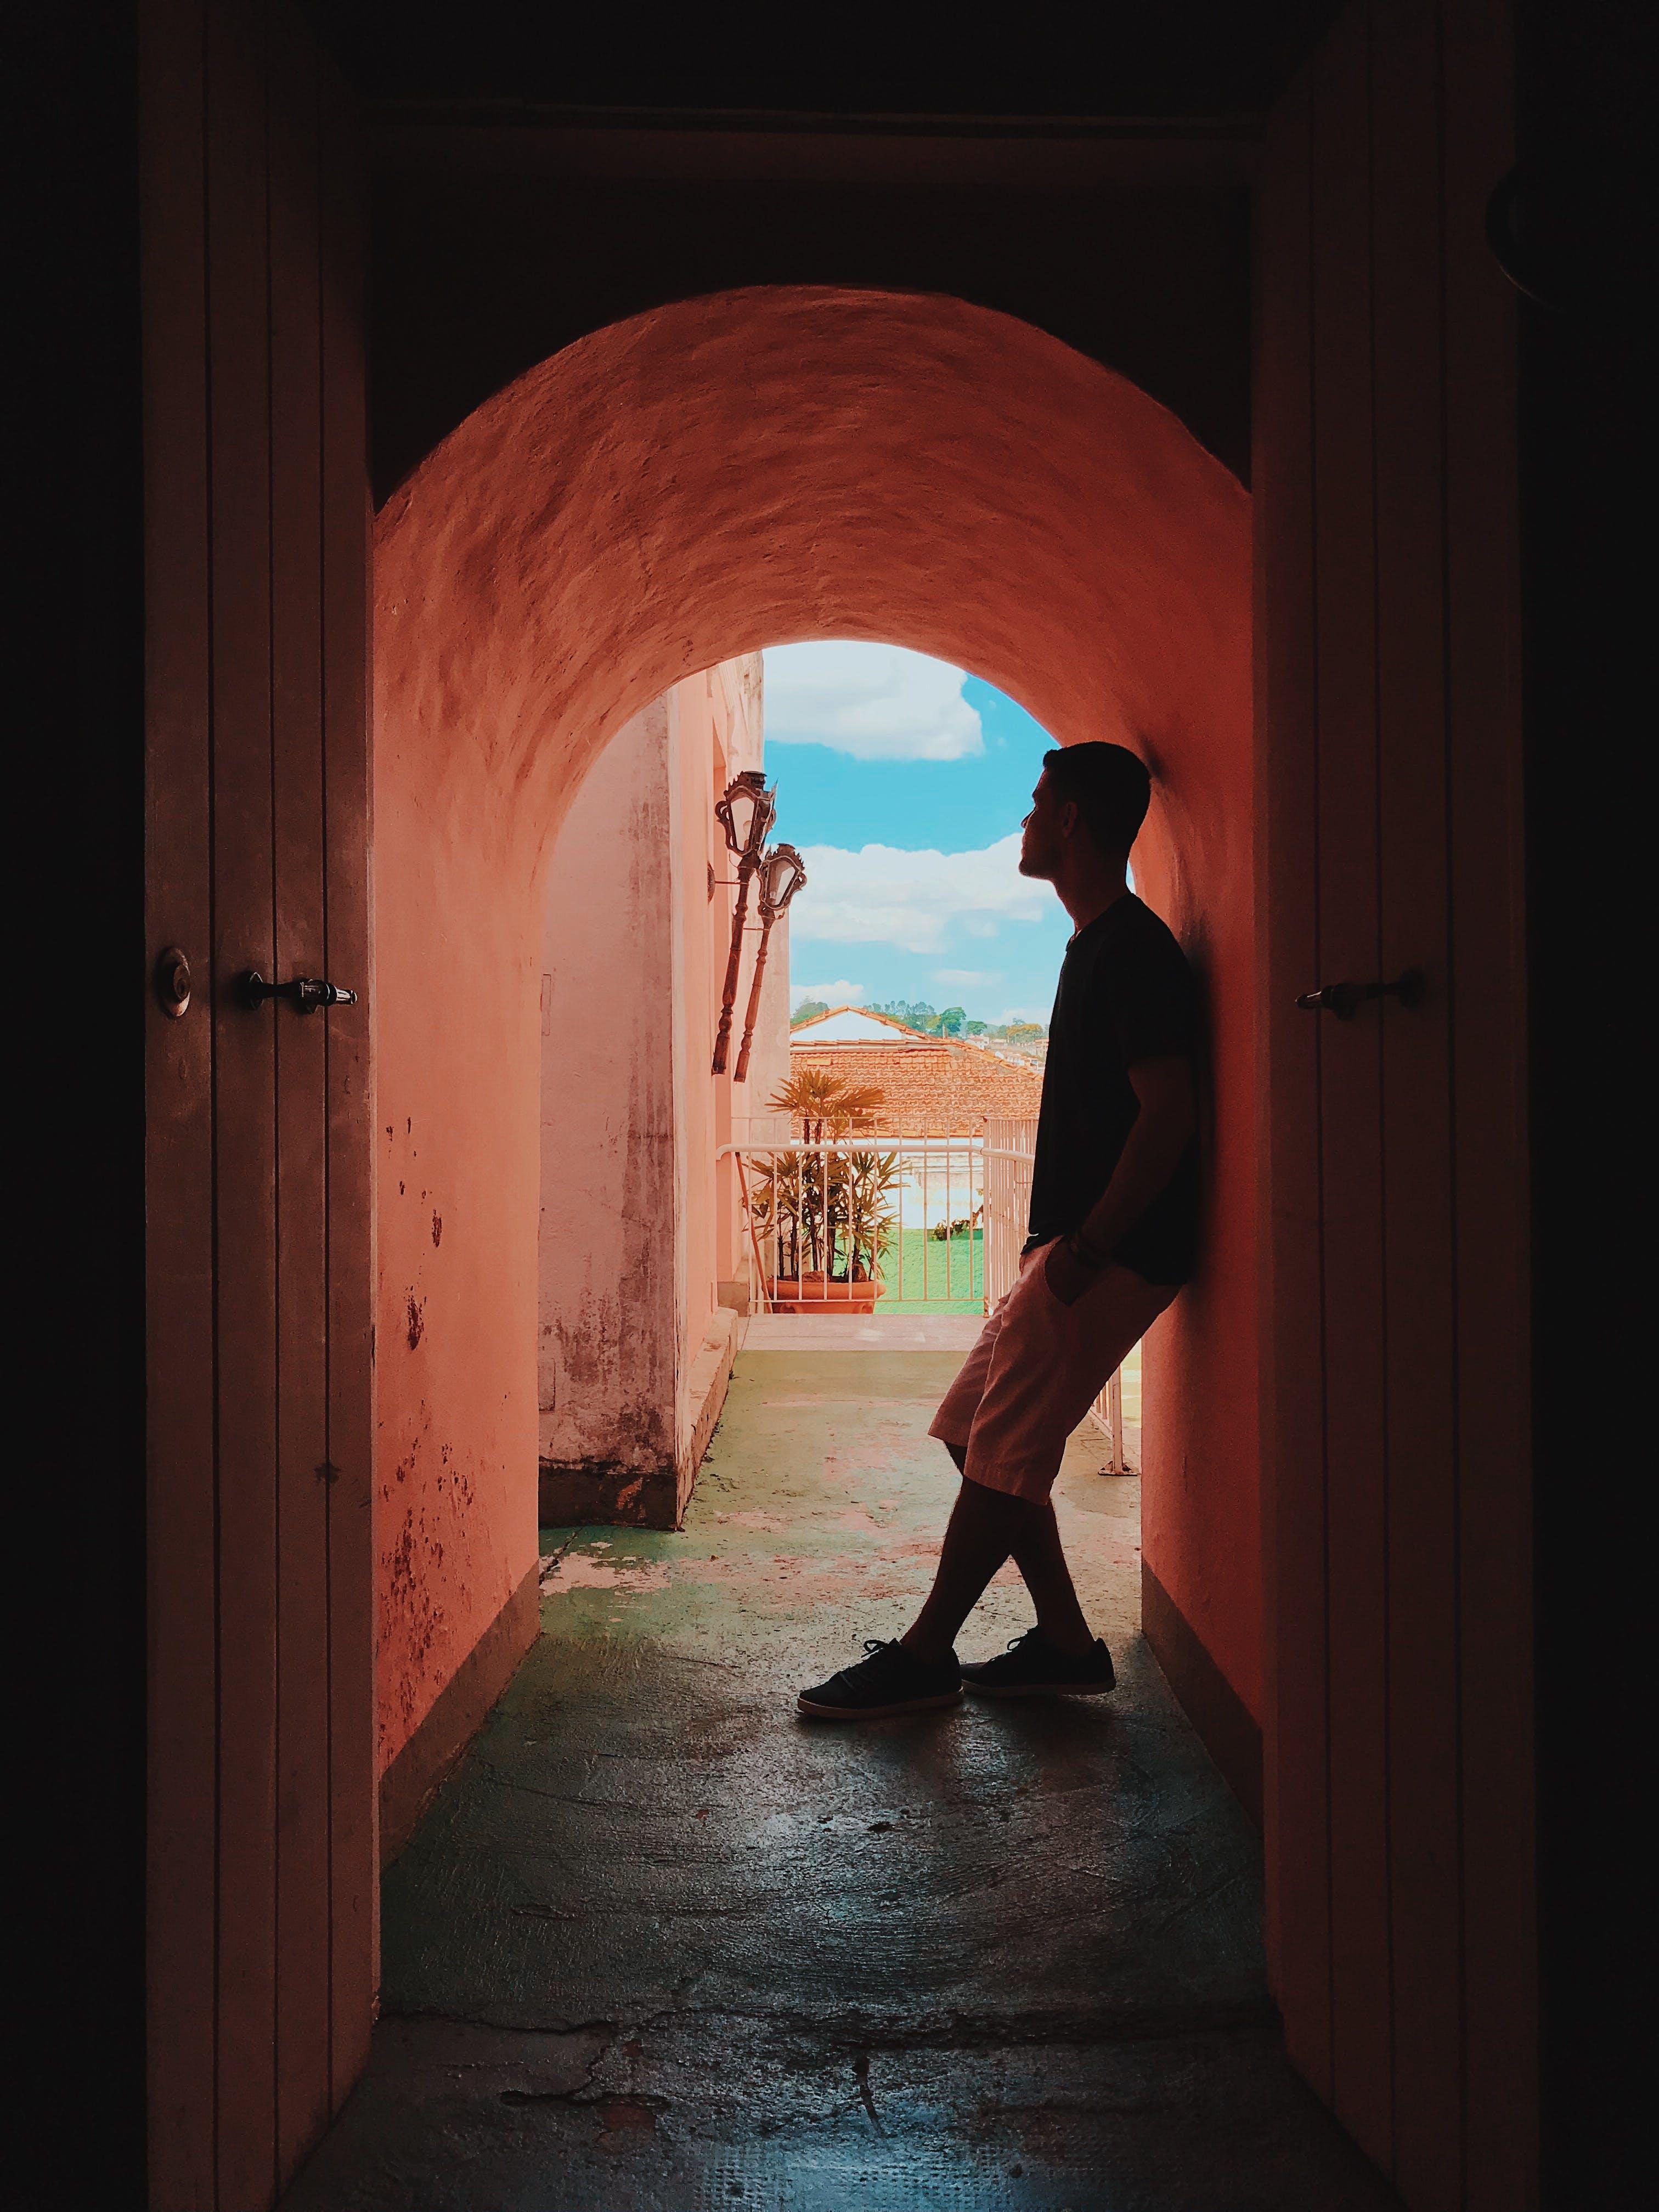 Man Standing In The Hallway